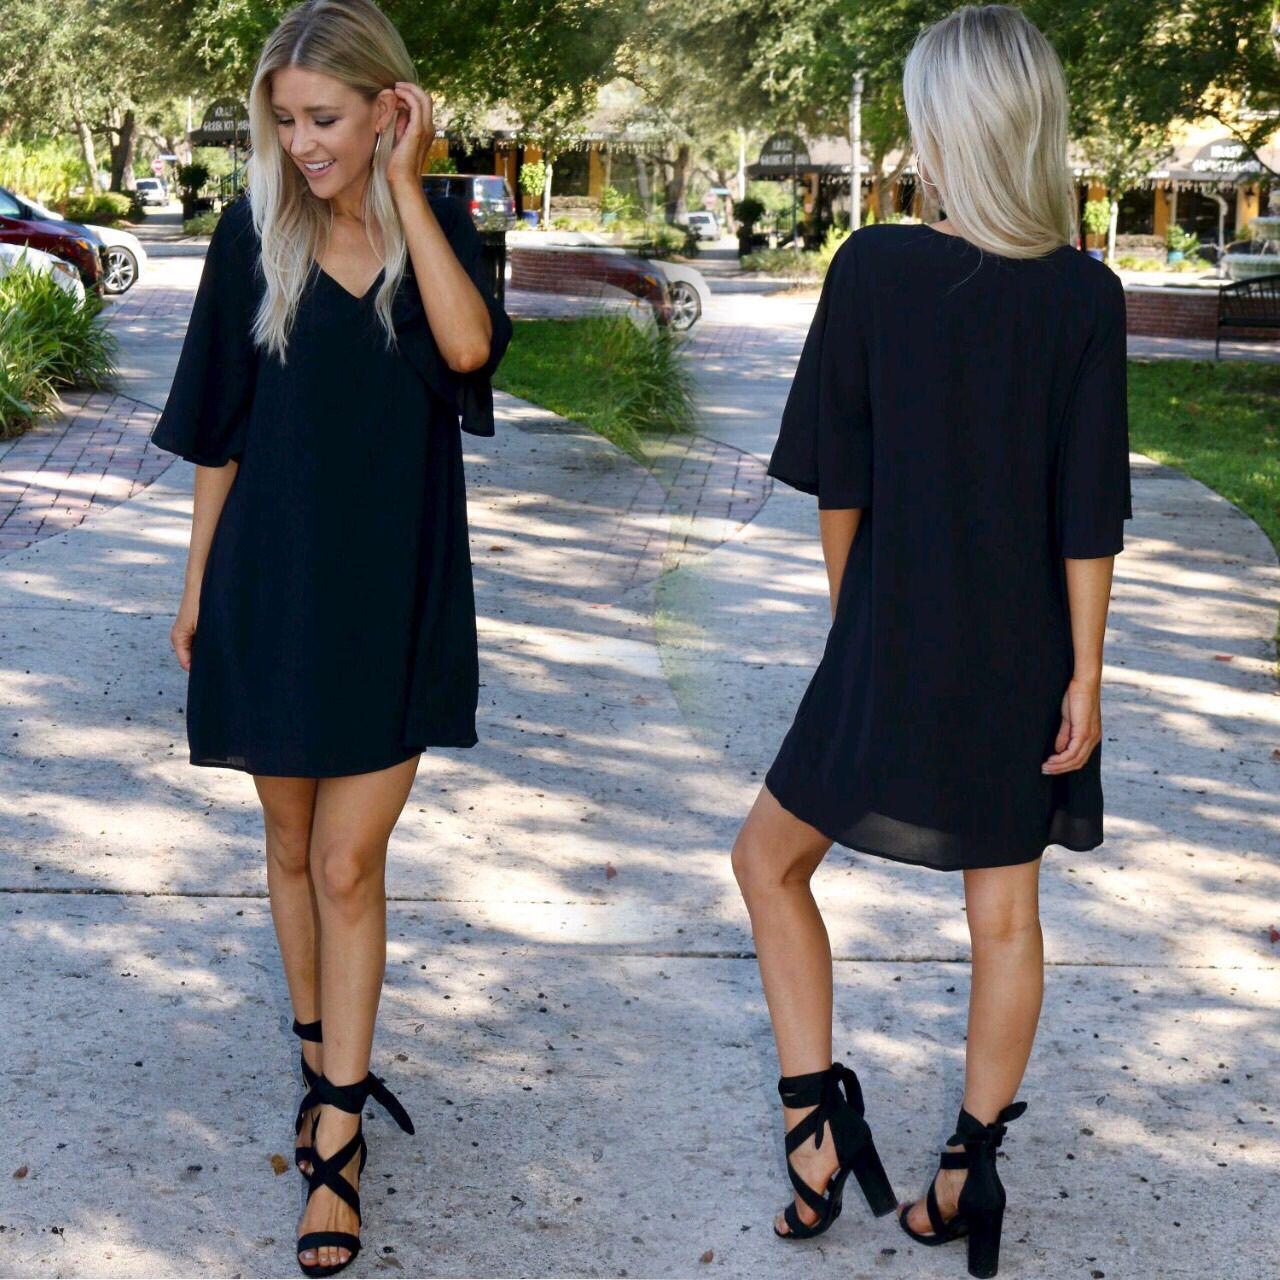 Short Bell Sleeve Dress Black Black Bell Sleeve Dress Black Graduation Dress Graduation Outfit [ 1280 x 1280 Pixel ]